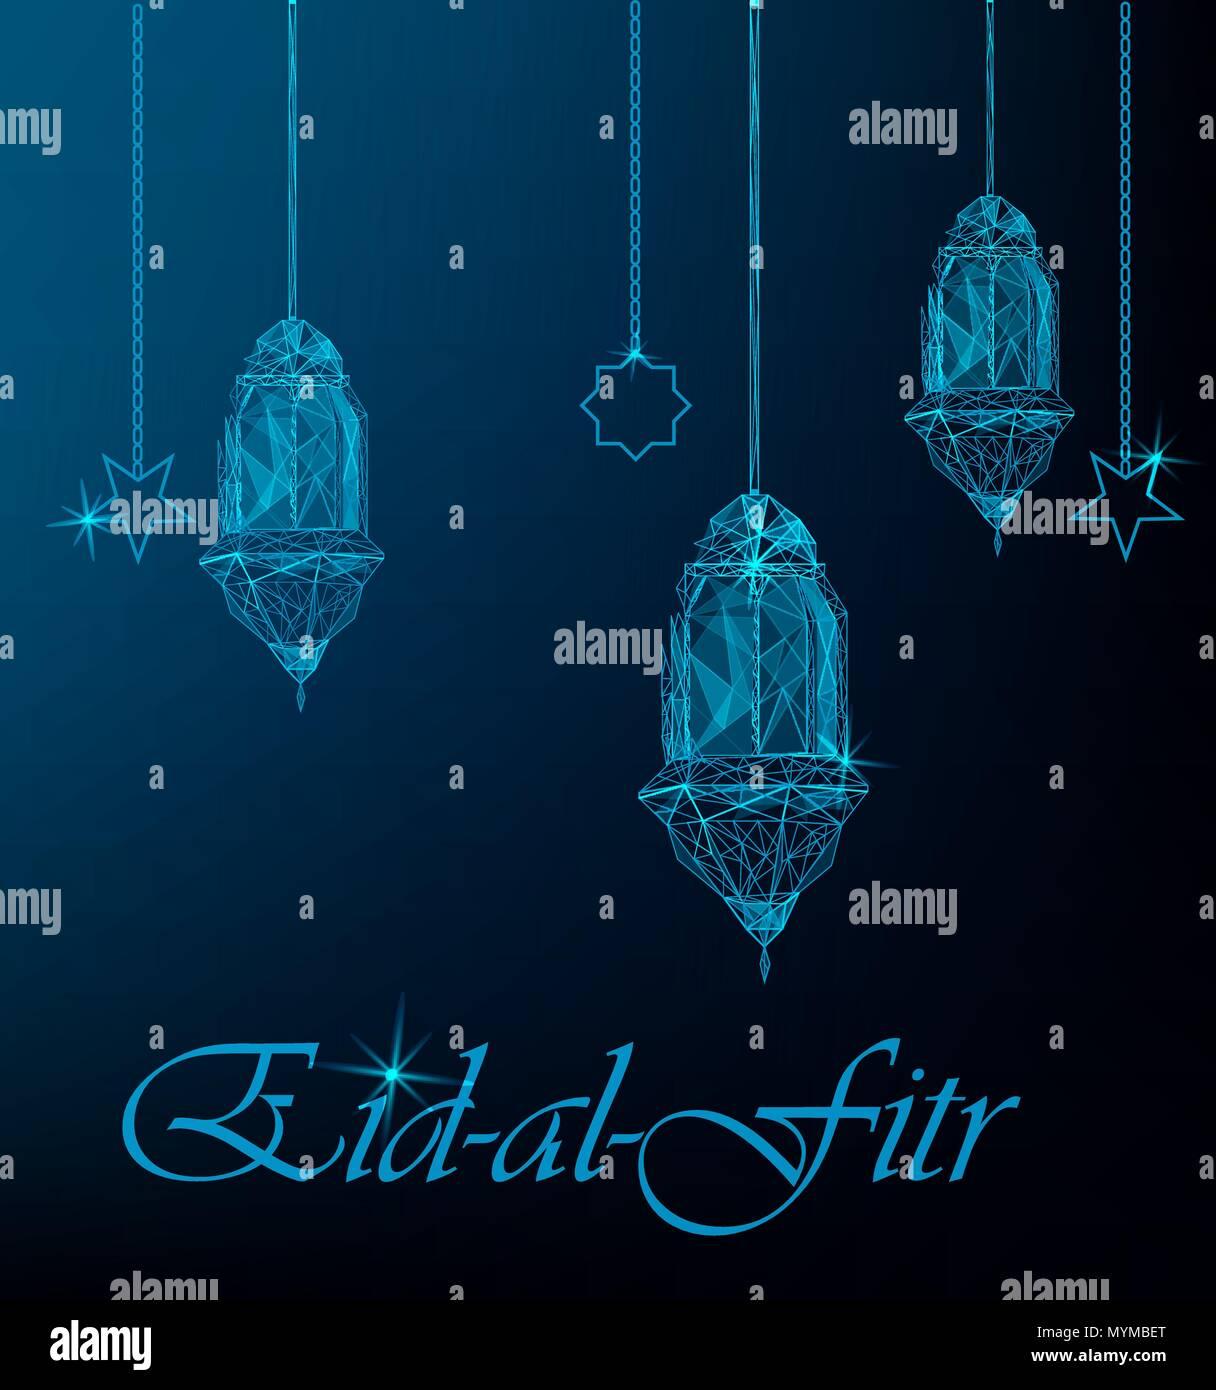 Eid Al Fitr Greeting Card With Hanging Traditional Arabic Lanterns